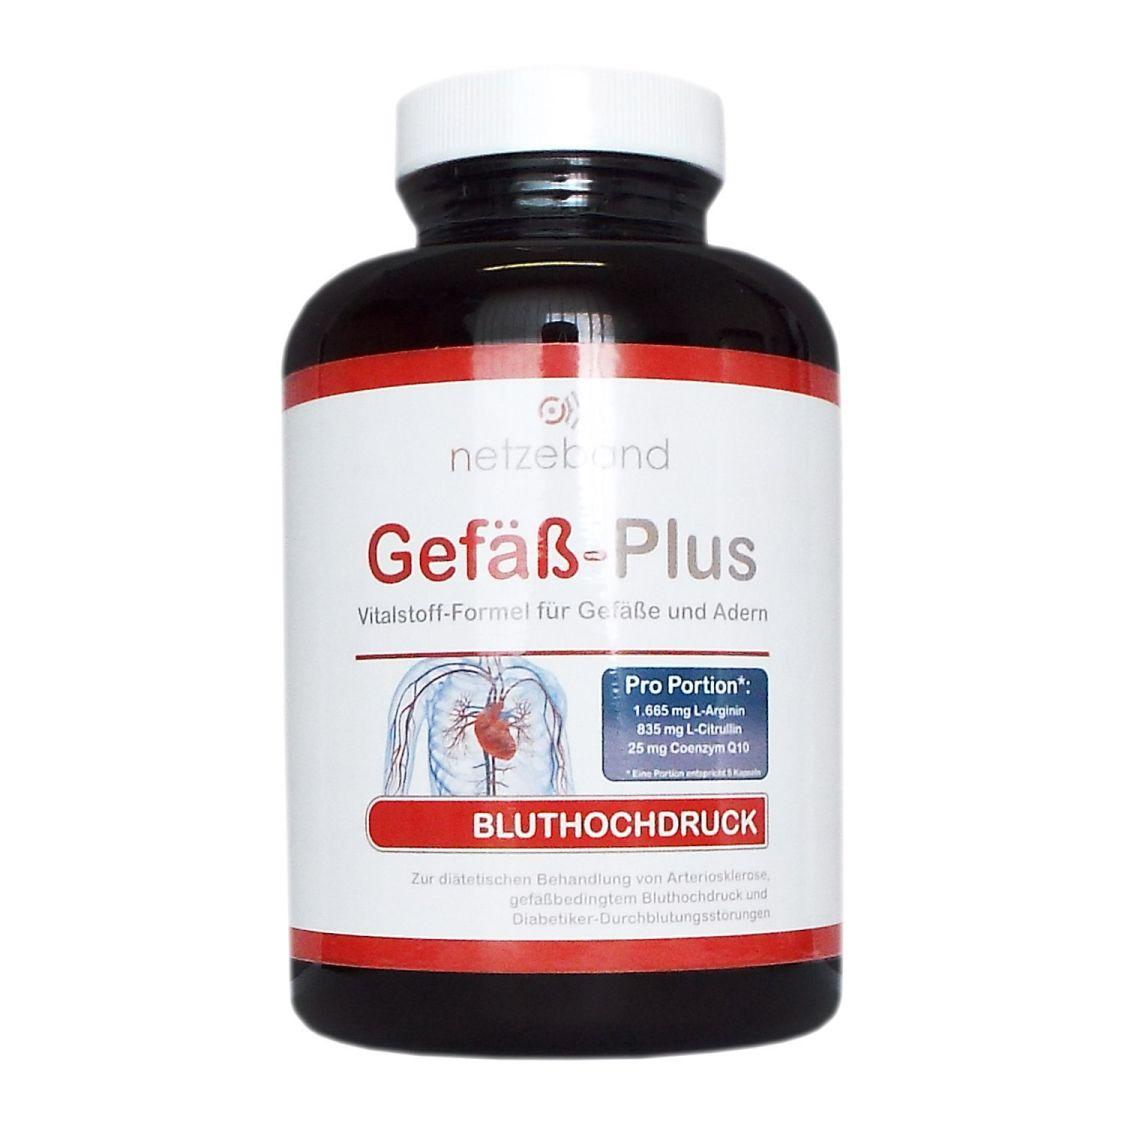 Netzeband Gefäß-Plus 300 Kapseln (L-Arginin/L-Citrullin/Q10) Blutdruck Gefäße